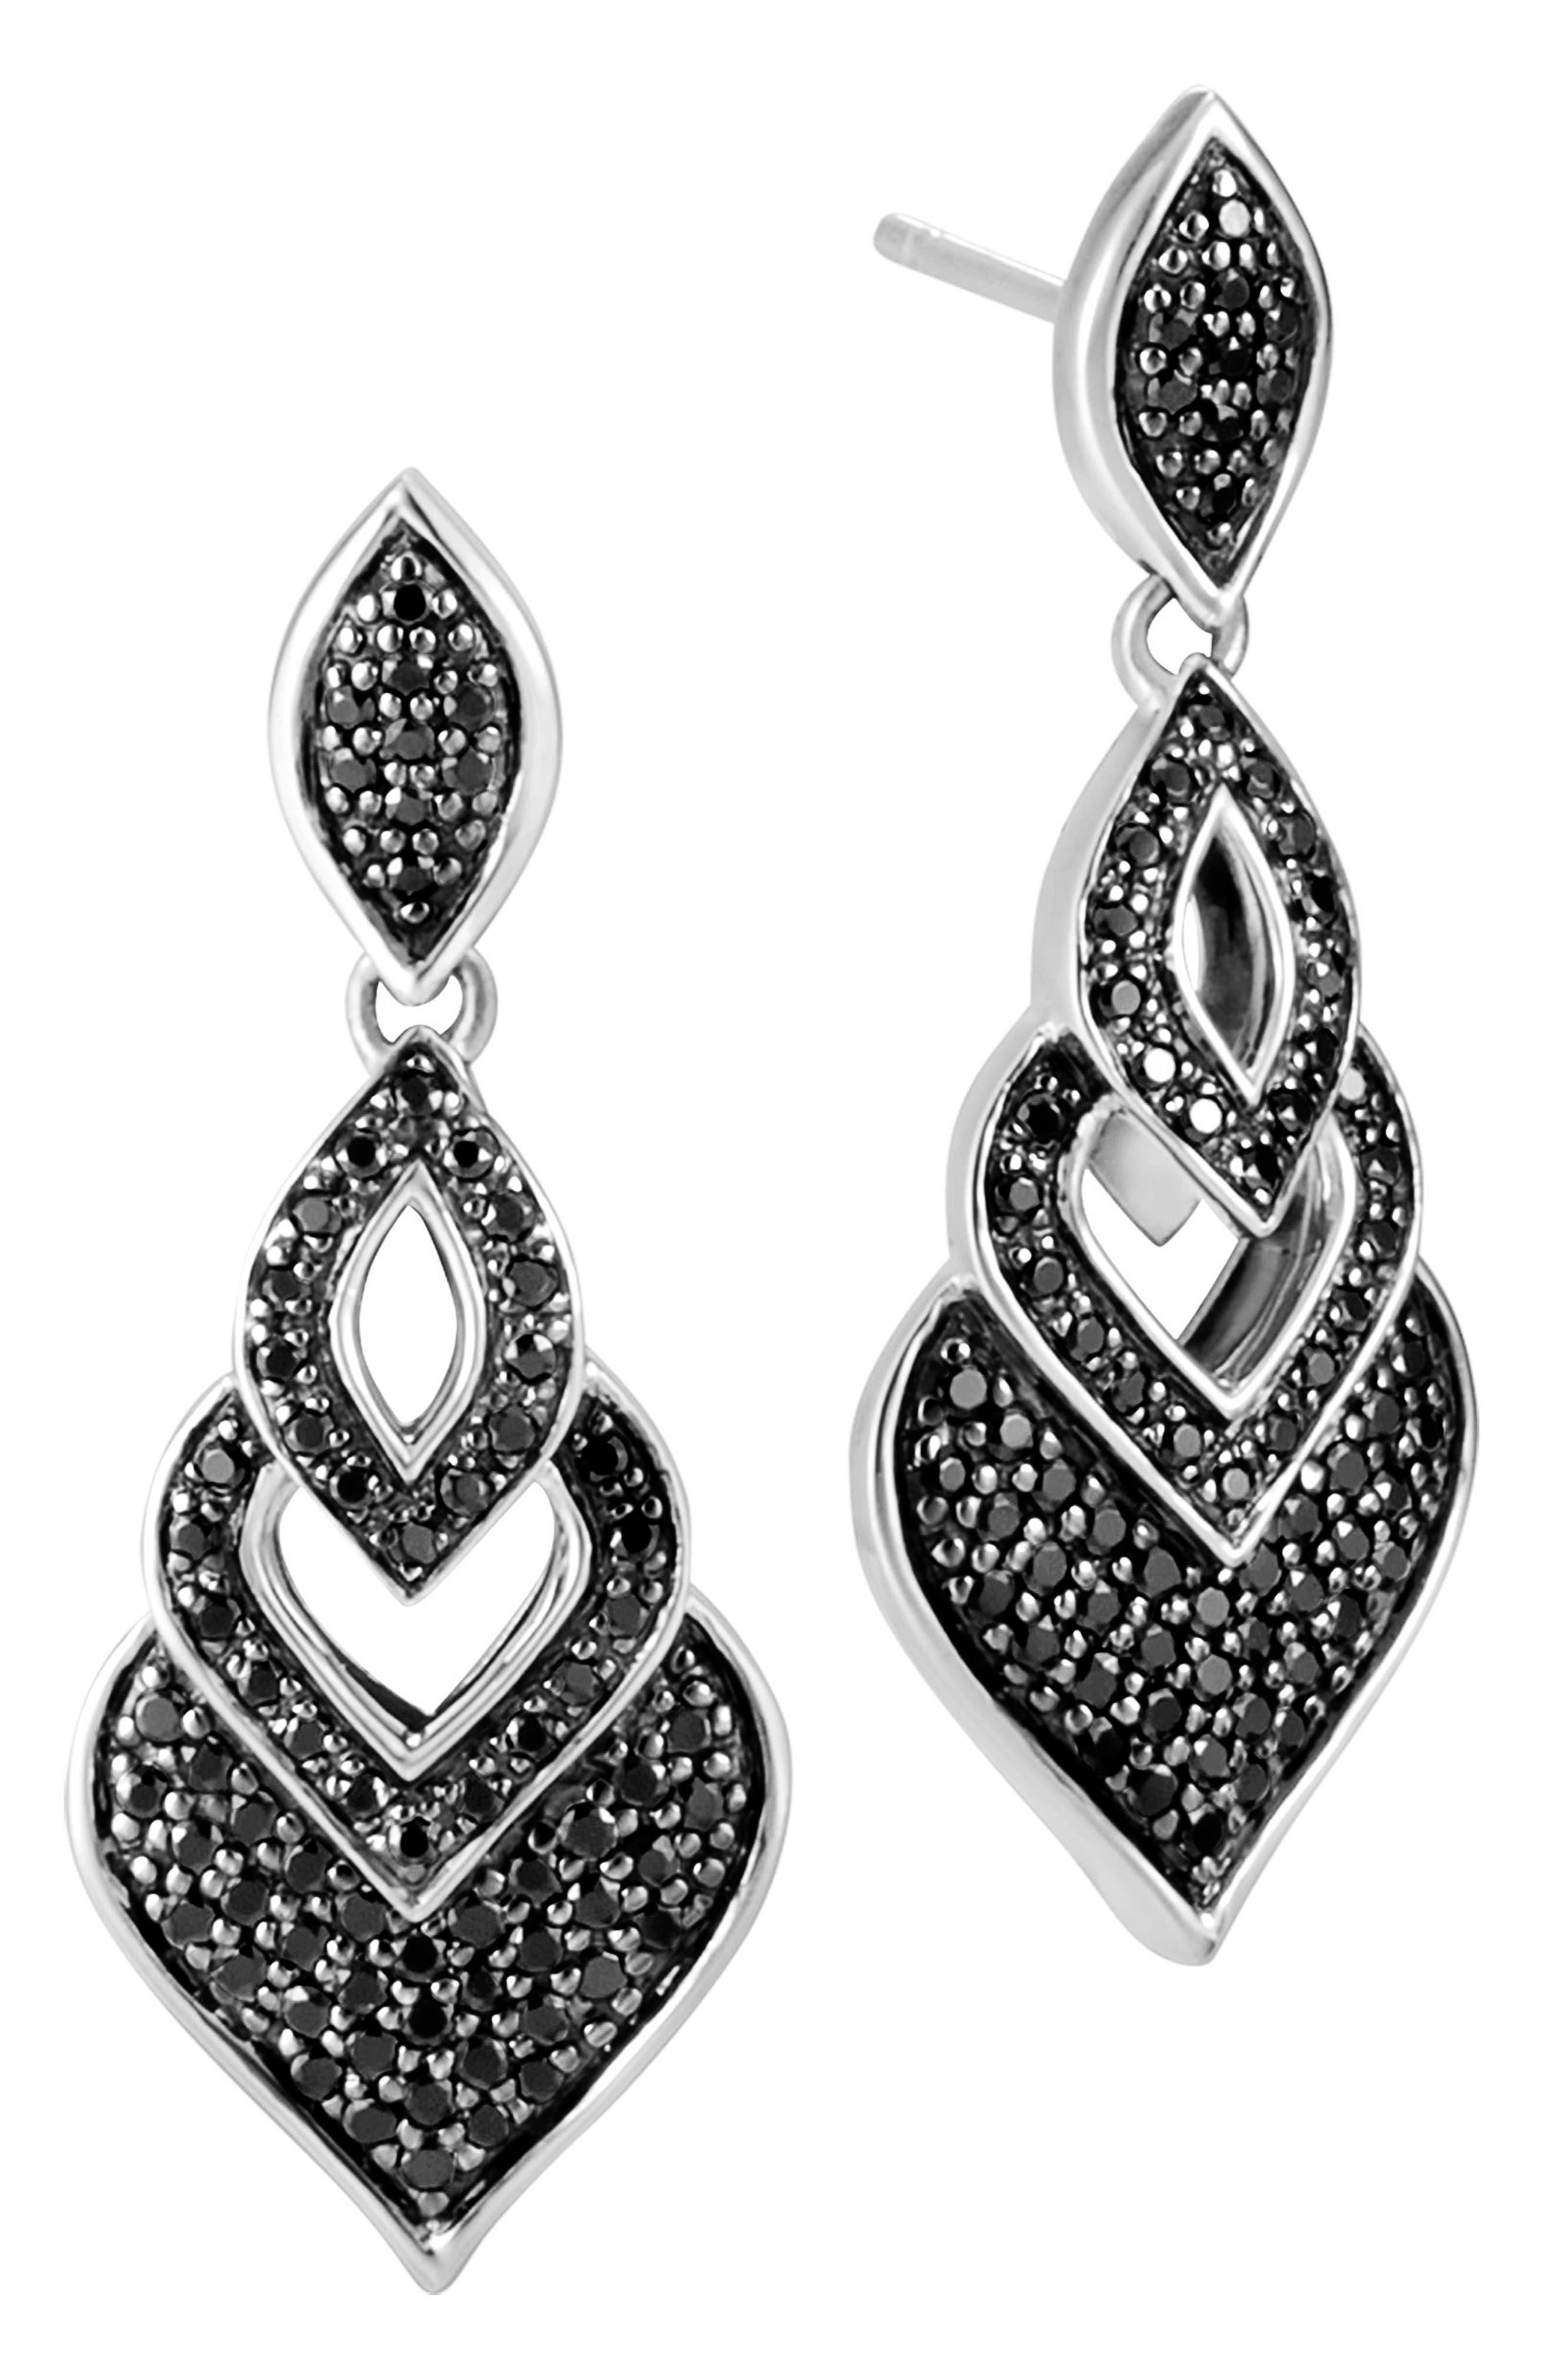 Legends Naga Drop Earrings,                         Main,                         color, Silver